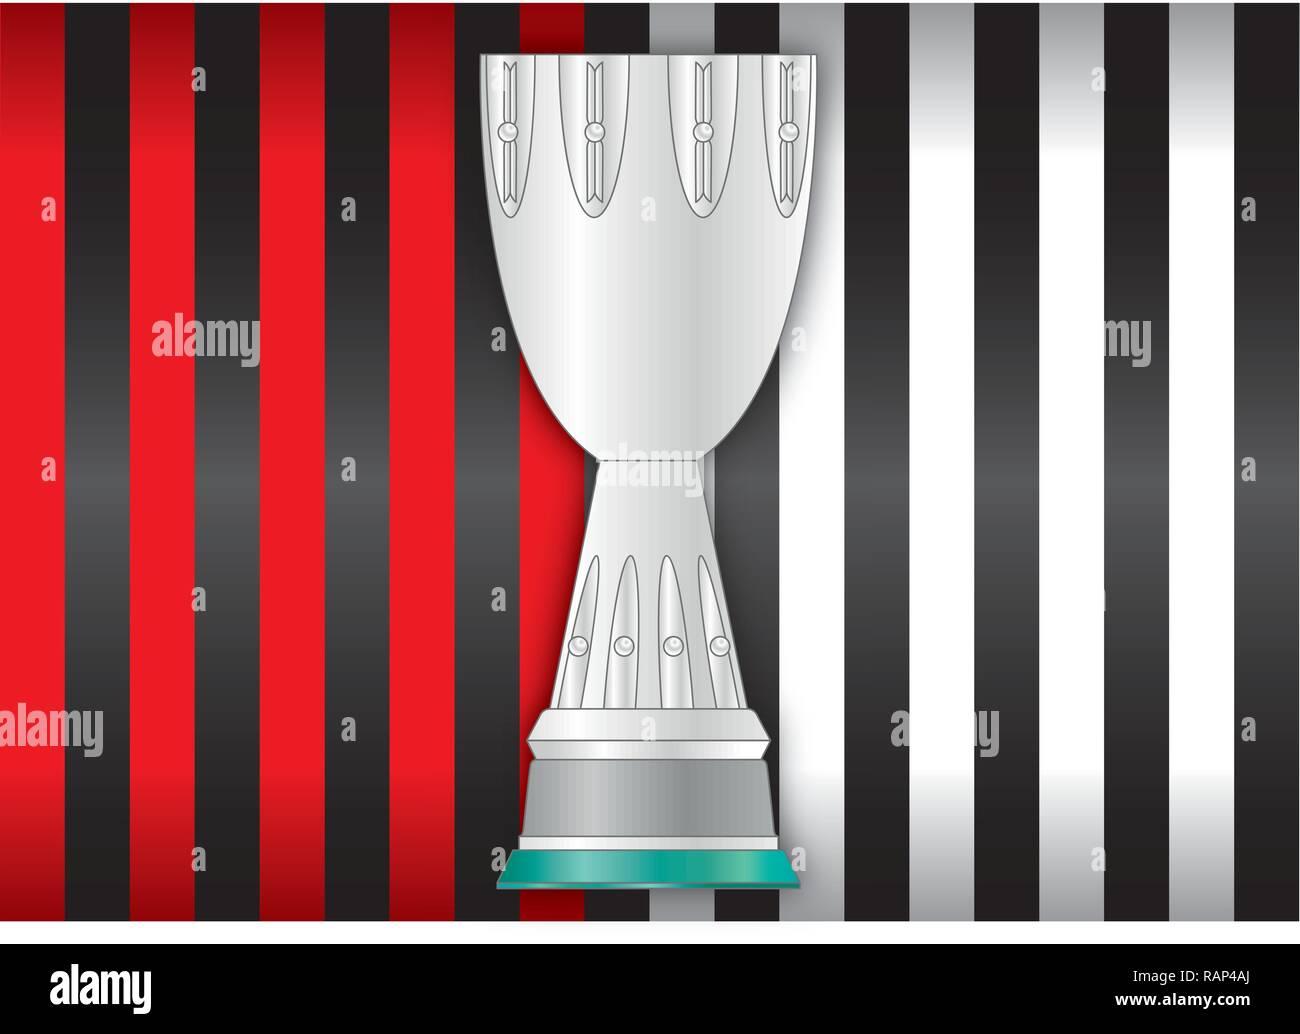 Milan VS Juventus, football teams flags and supercoppa silhouette, vector illustration - Stock Vector